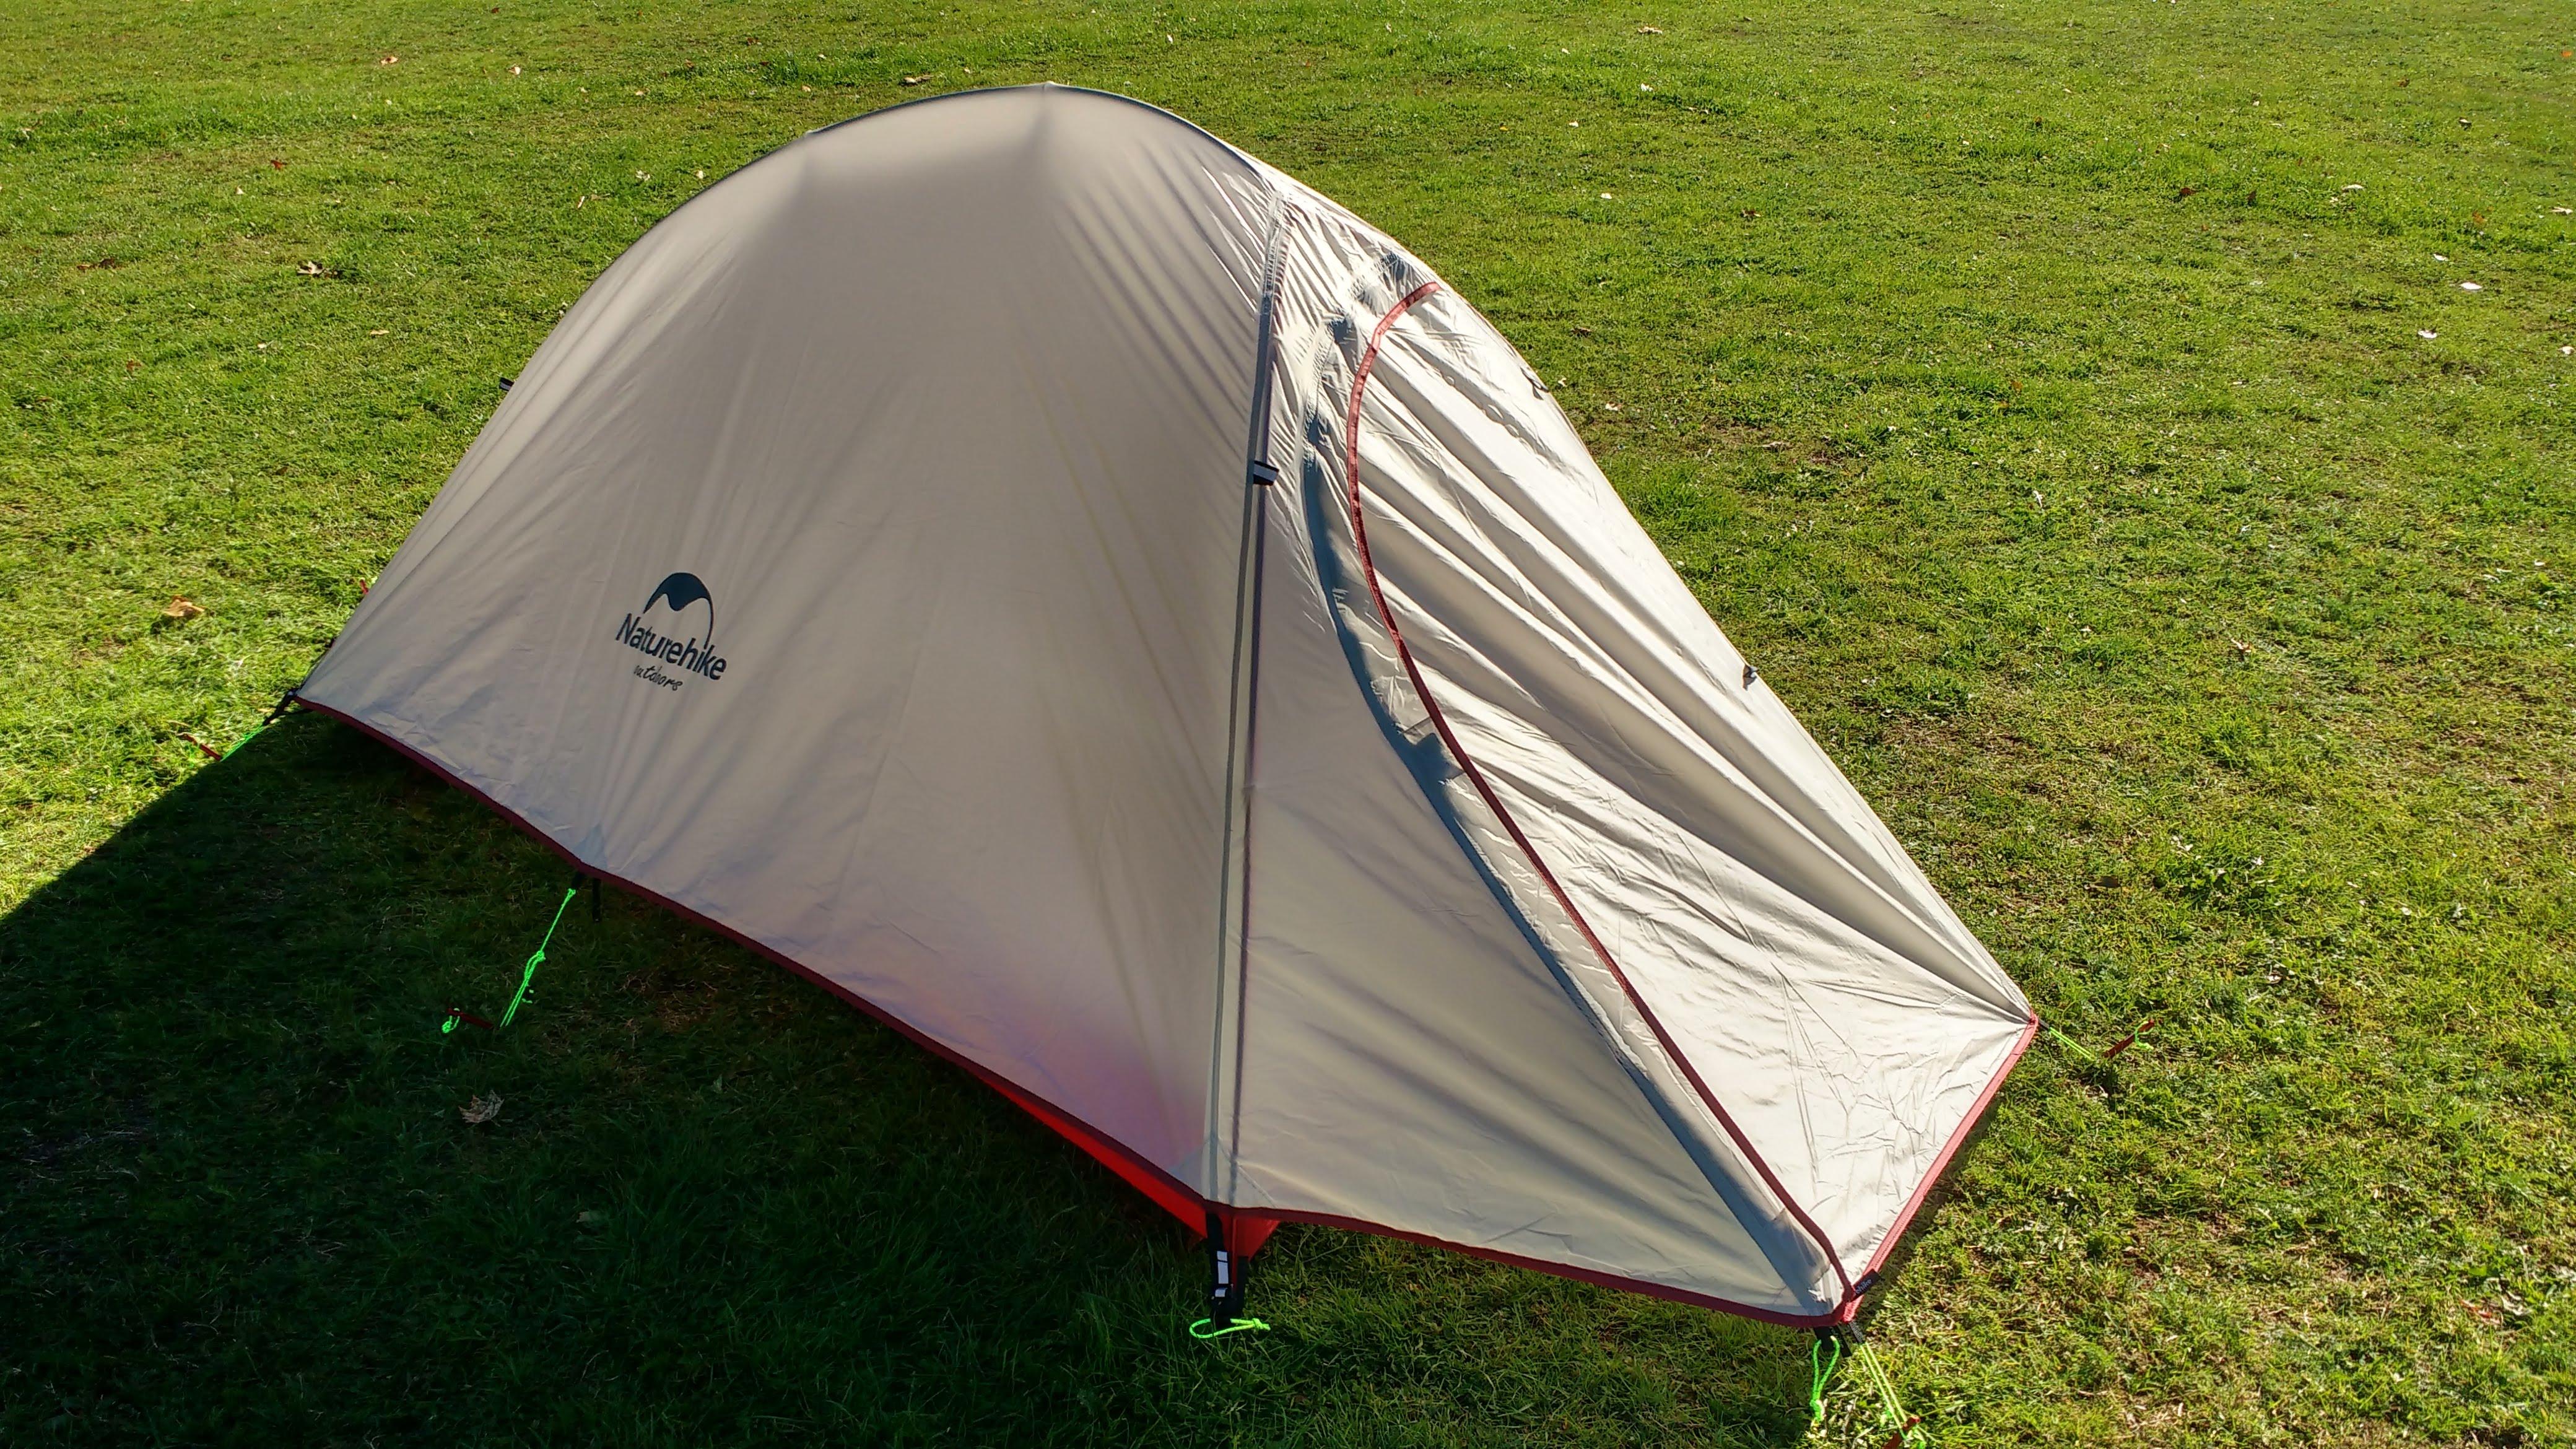 The Naturehike Cloud-Up Tent